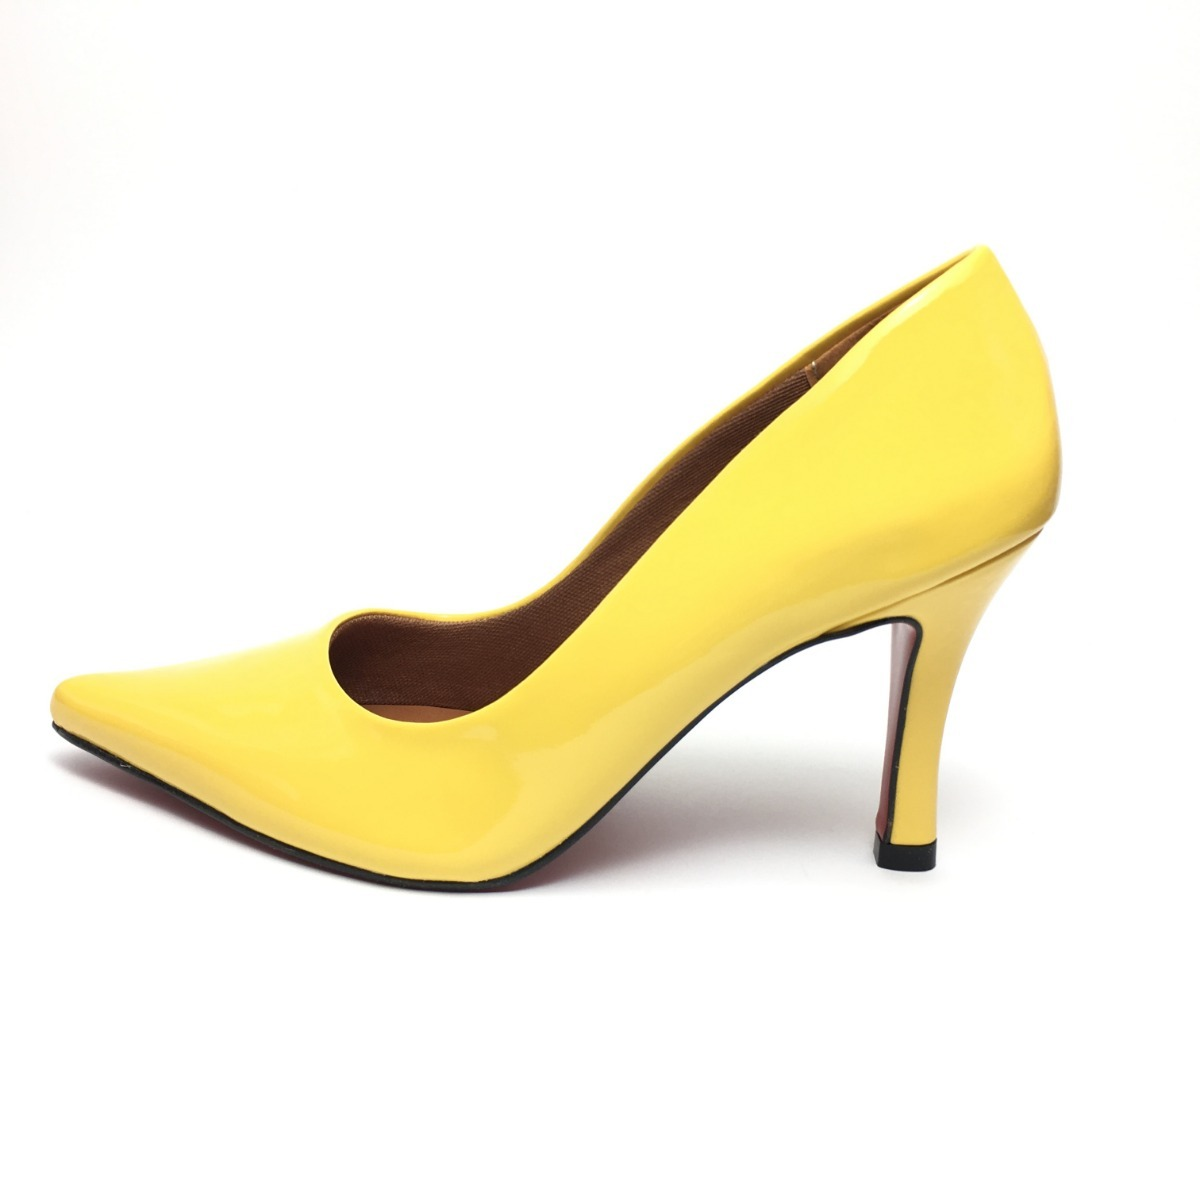 a08a269d27 sapato feminino scarpin salto alto verniz festa nude amarelo. Carregando  zoom.